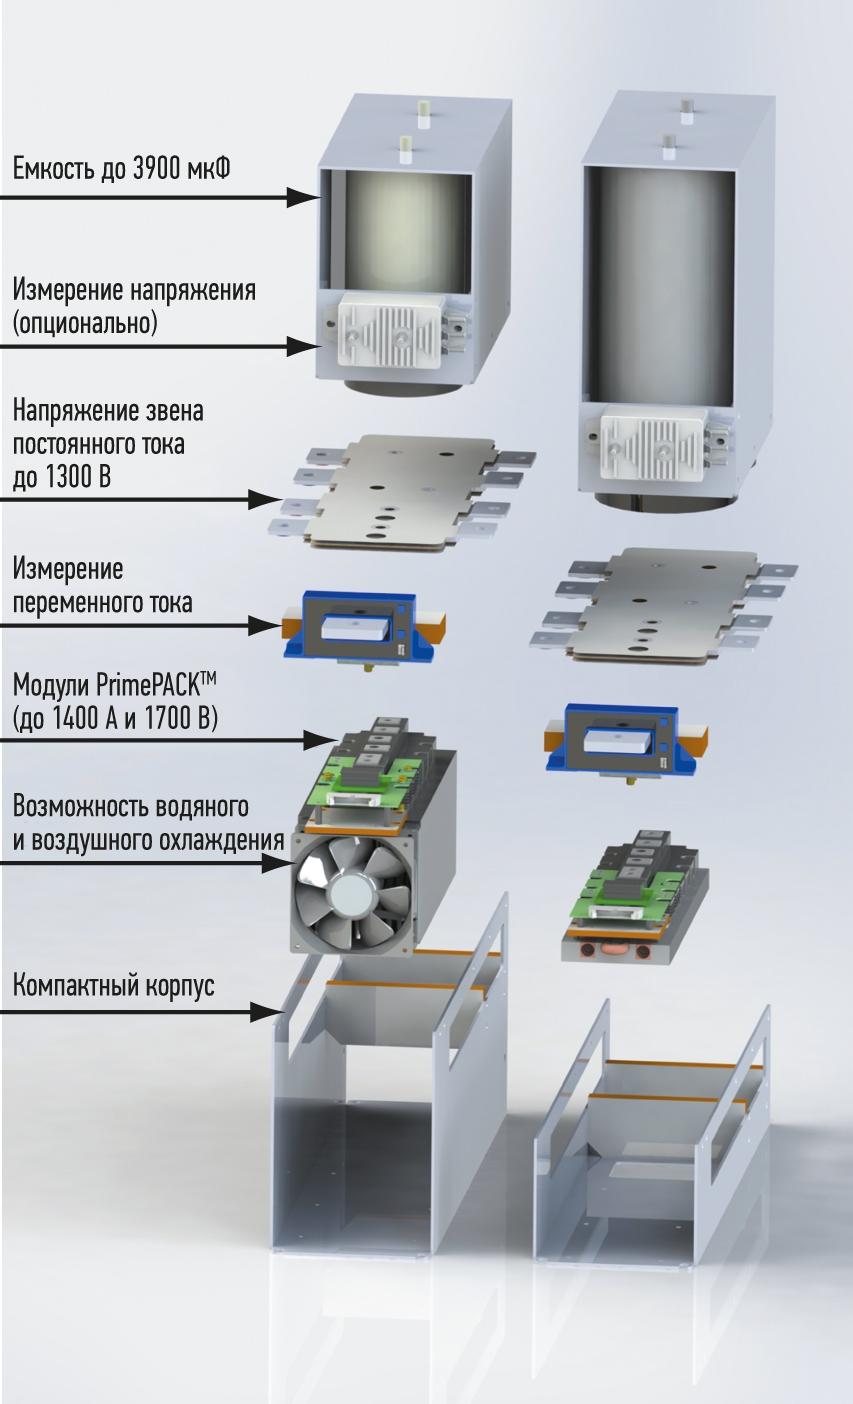 Детализация VARISAir и VARIS Water